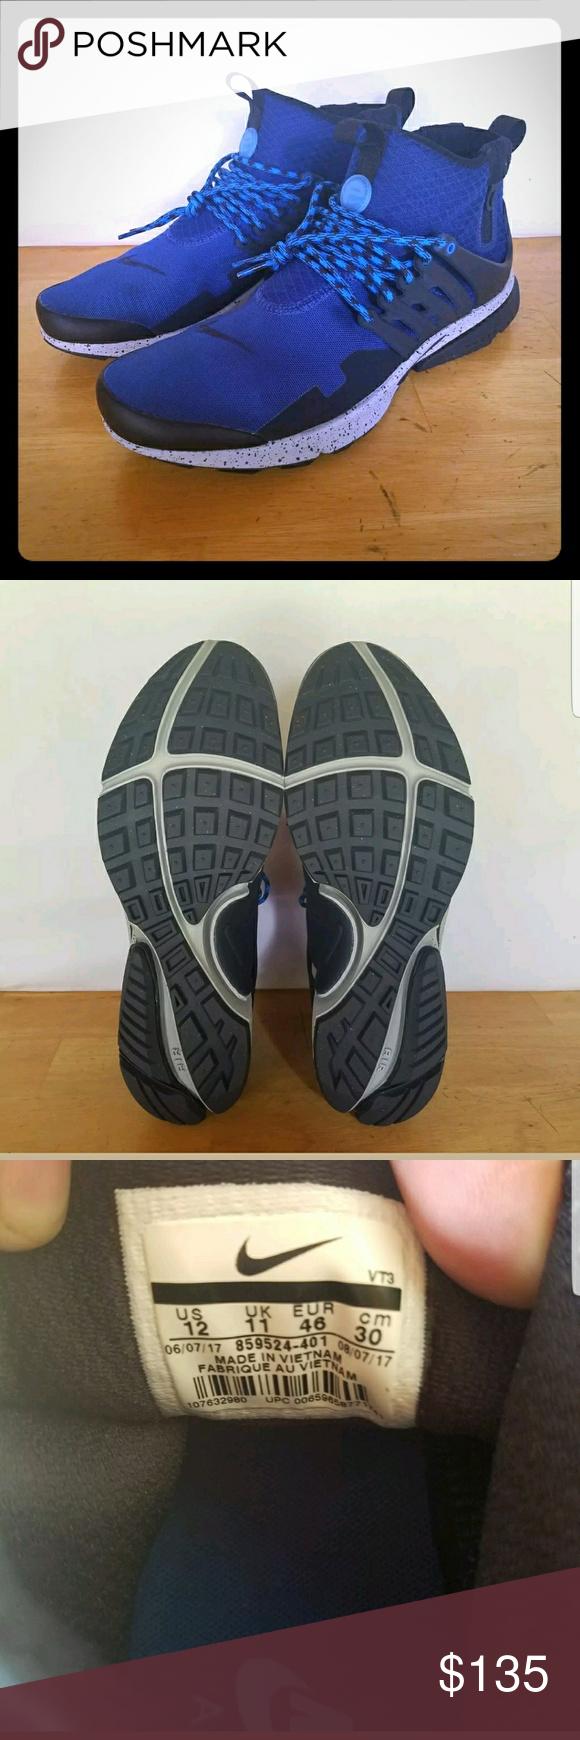 sale retailer 139ef 3218d Nike Air Presto Mid Utility Size US 12 Mens Shoes Nike Air Presto Mid  Utility Size